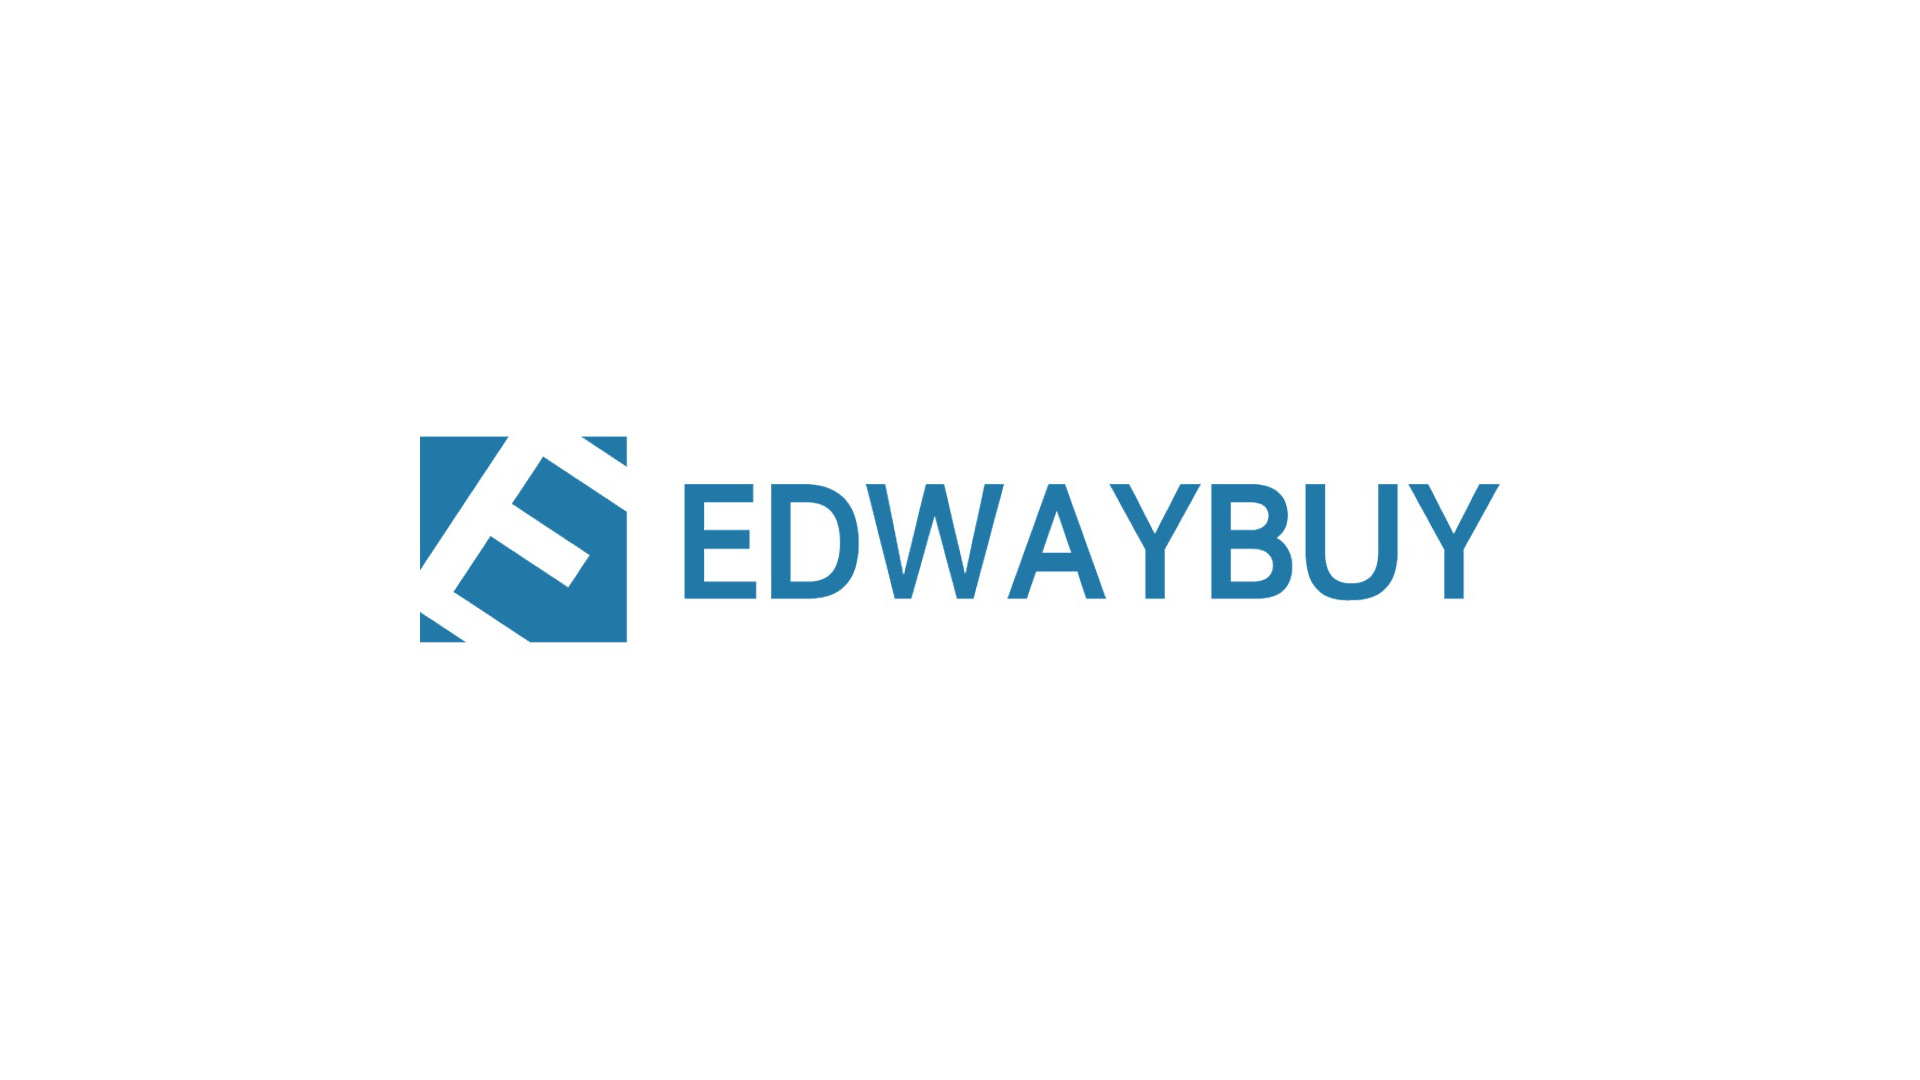 Edwaybuy Black Friday 2020